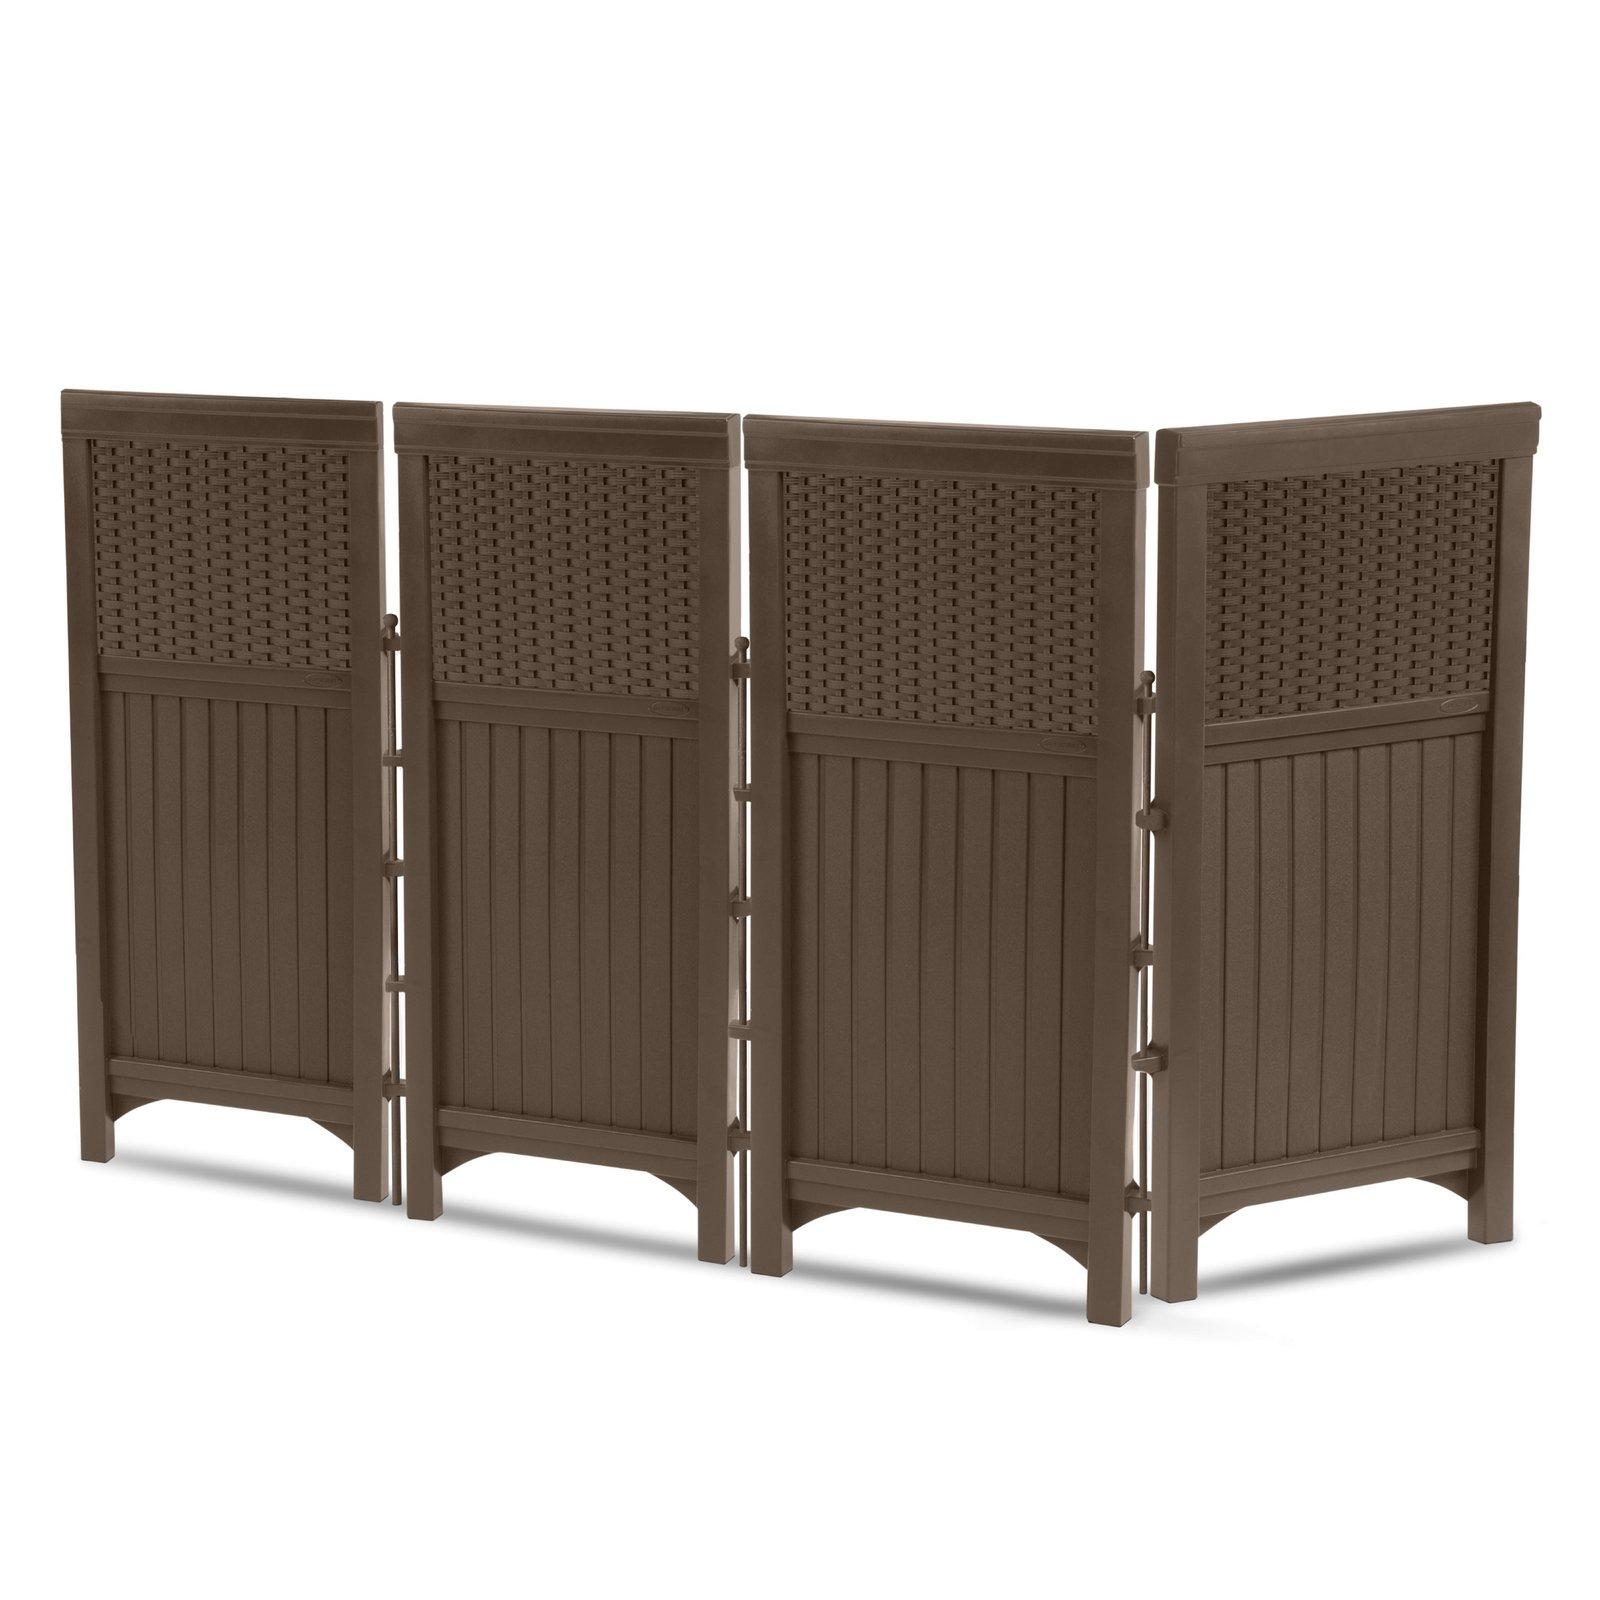 Patio screen enclosure outdoor garden fence furniture for Outdoor patio screen panels